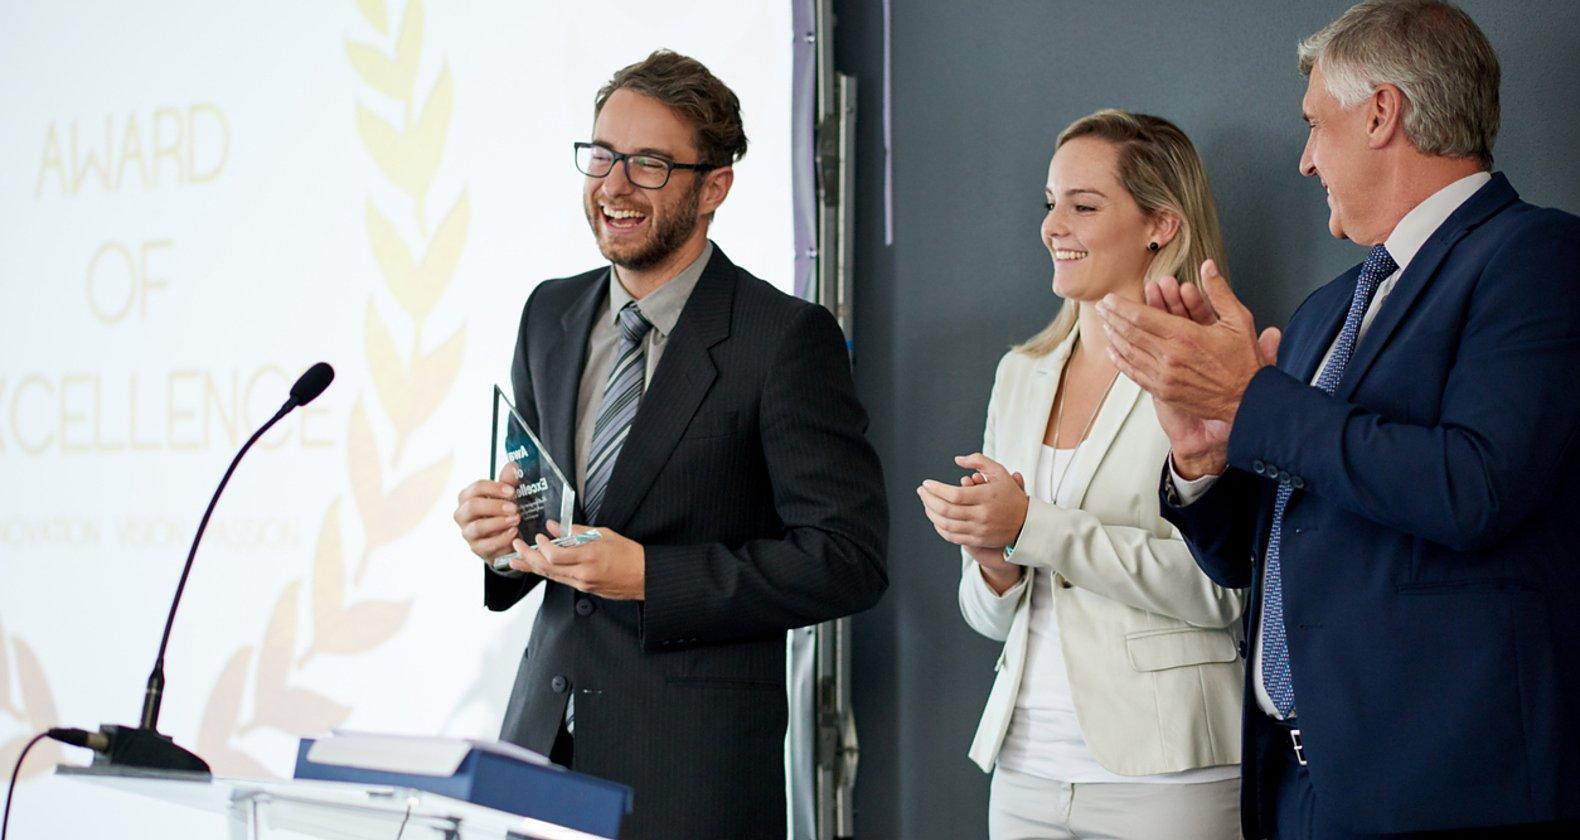 SDGsの国際的な企業コンテストGlobal SDG Awardから学ぶSDGs的なビジネスの特徴の画像